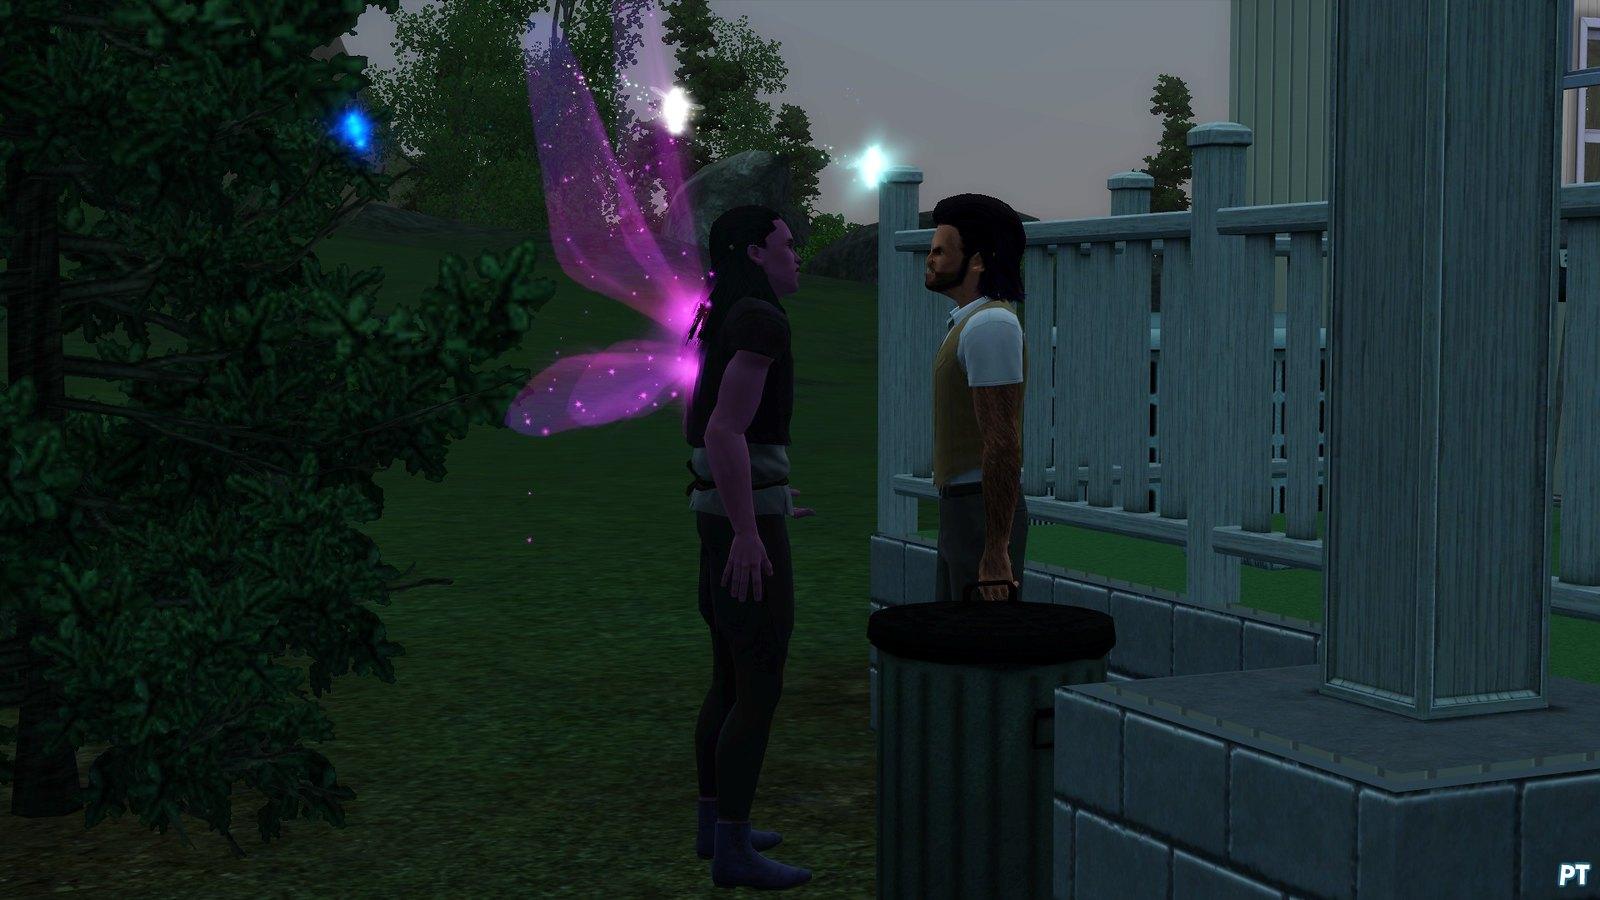 Sims 3 Bovennatuurlijk Feeënkoningin